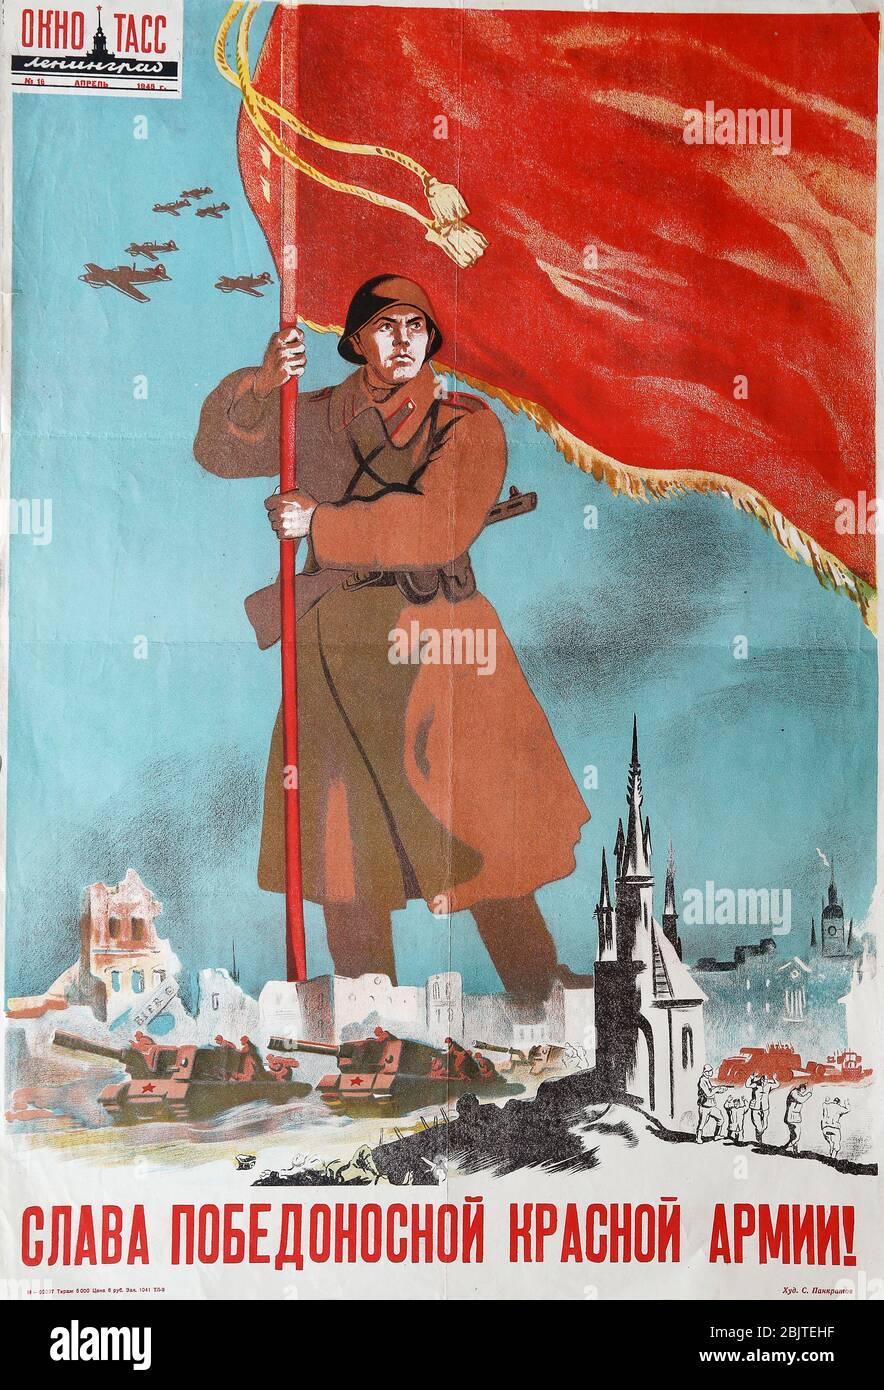 The Great Patriotic War 1941-1945 Postcard World War II Second World War Posters Propaganda of Great Patriotic War Military postcard Zhukov